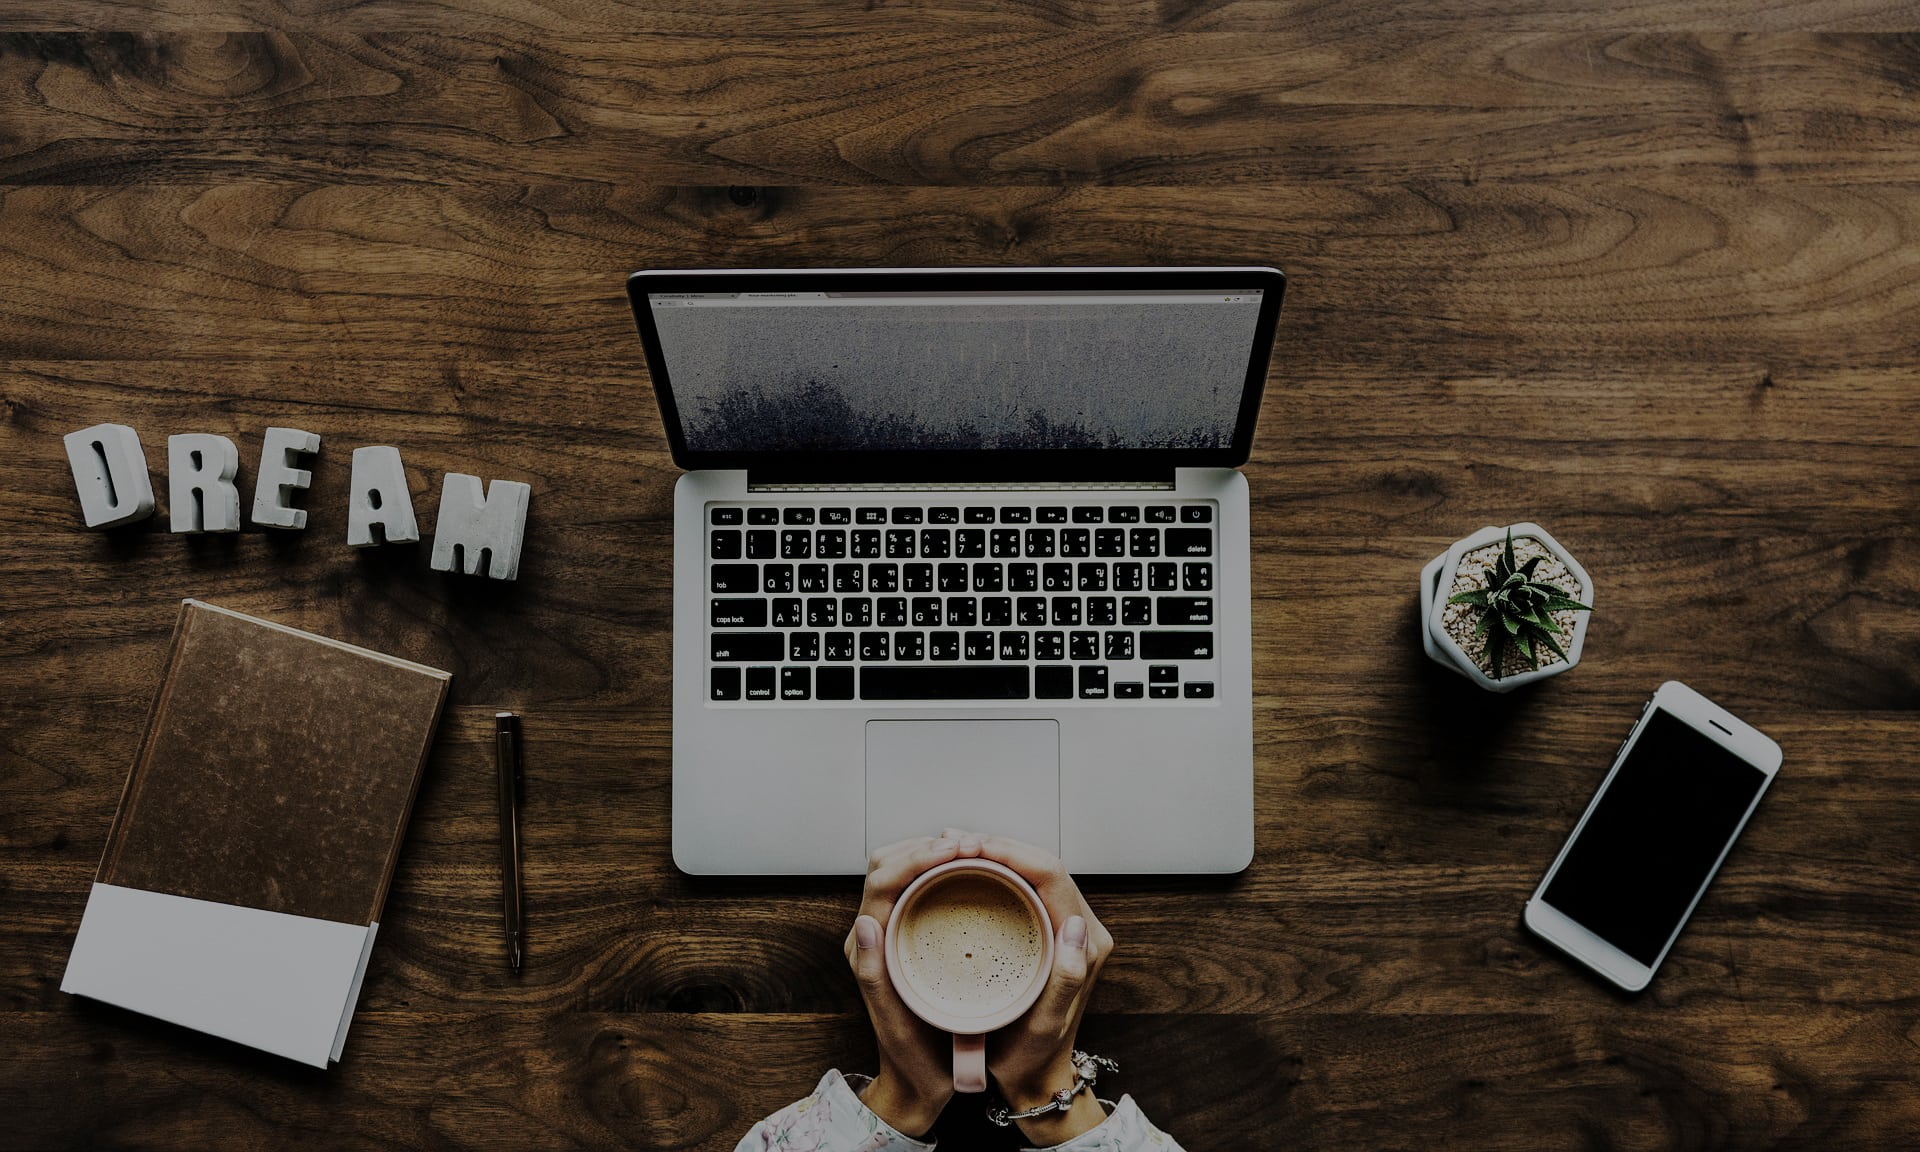 6 Key Differences Between Mobile vs. Desktop for Social Media